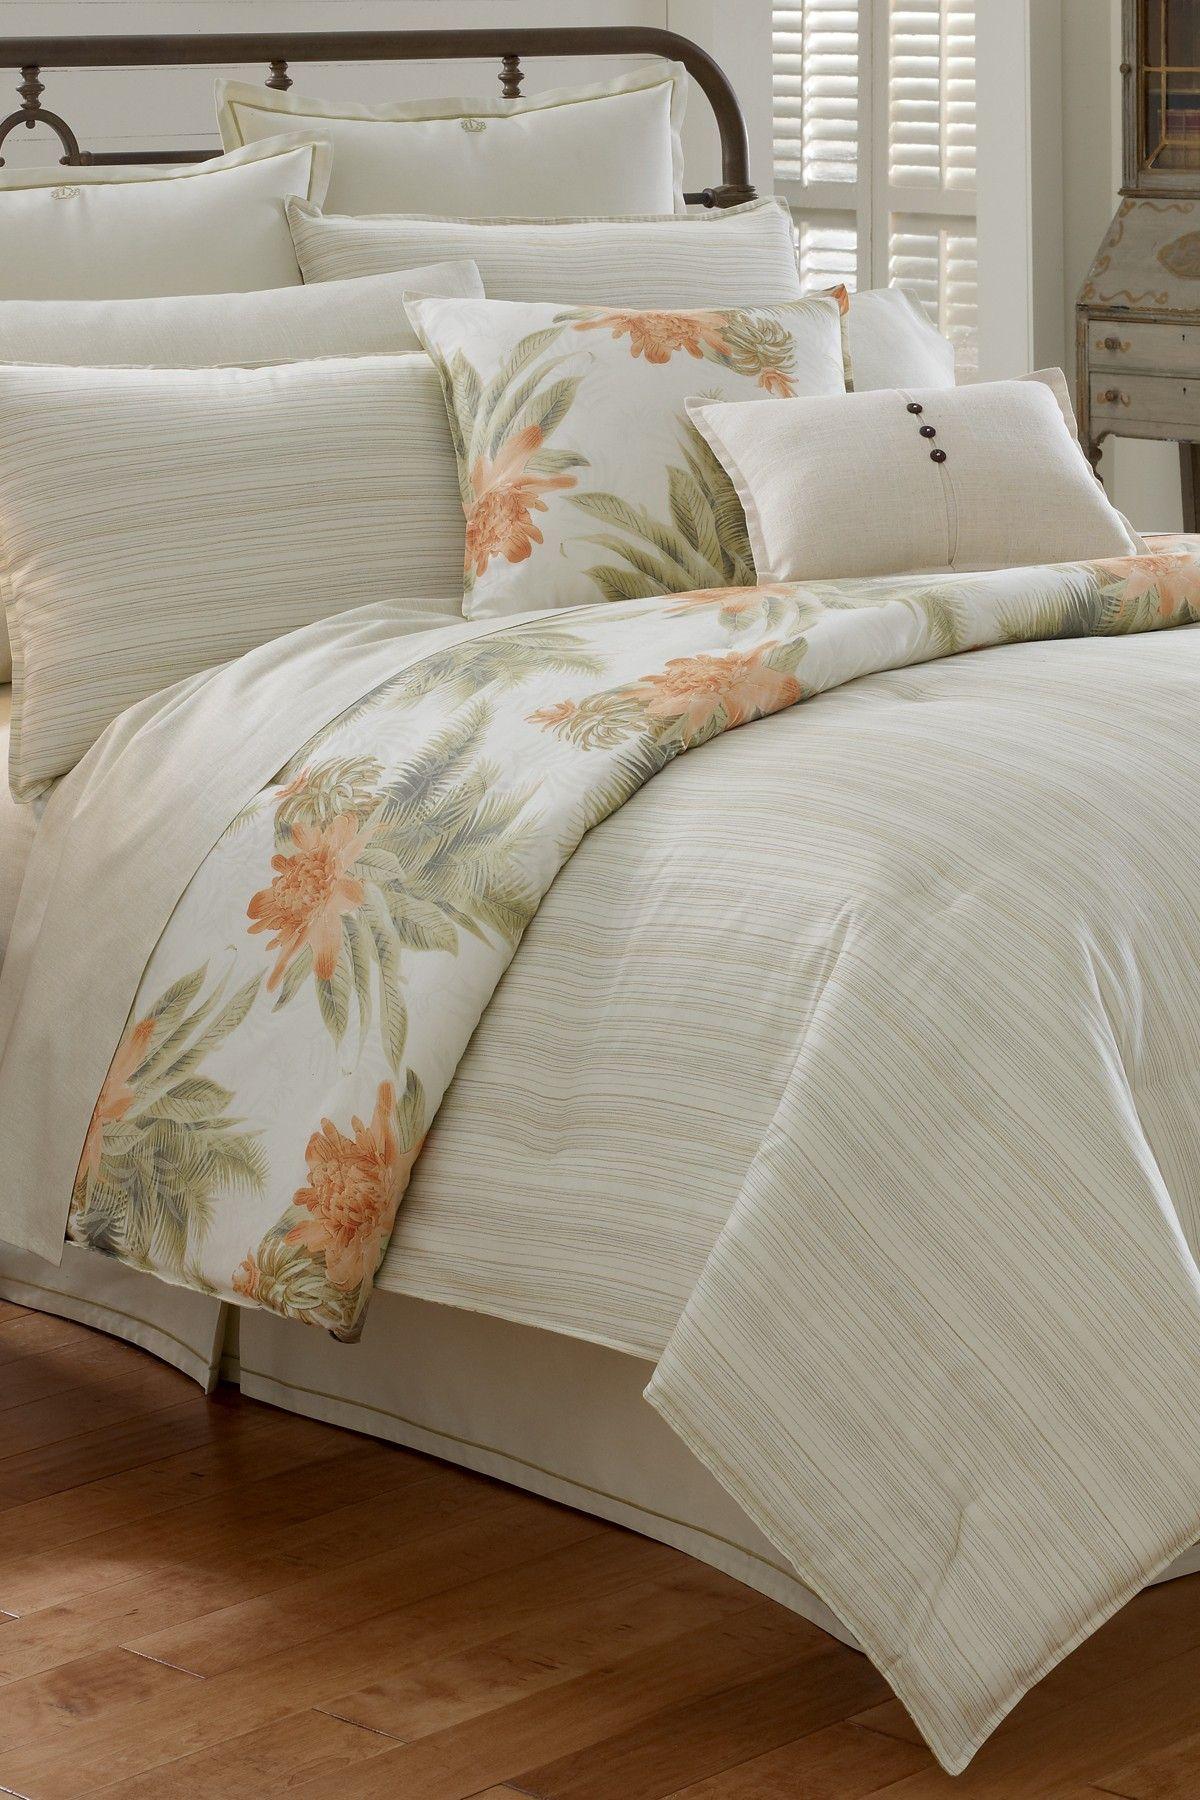 Tommy Bahama Bedding Abacos Island Queen Comforter Set Bisque